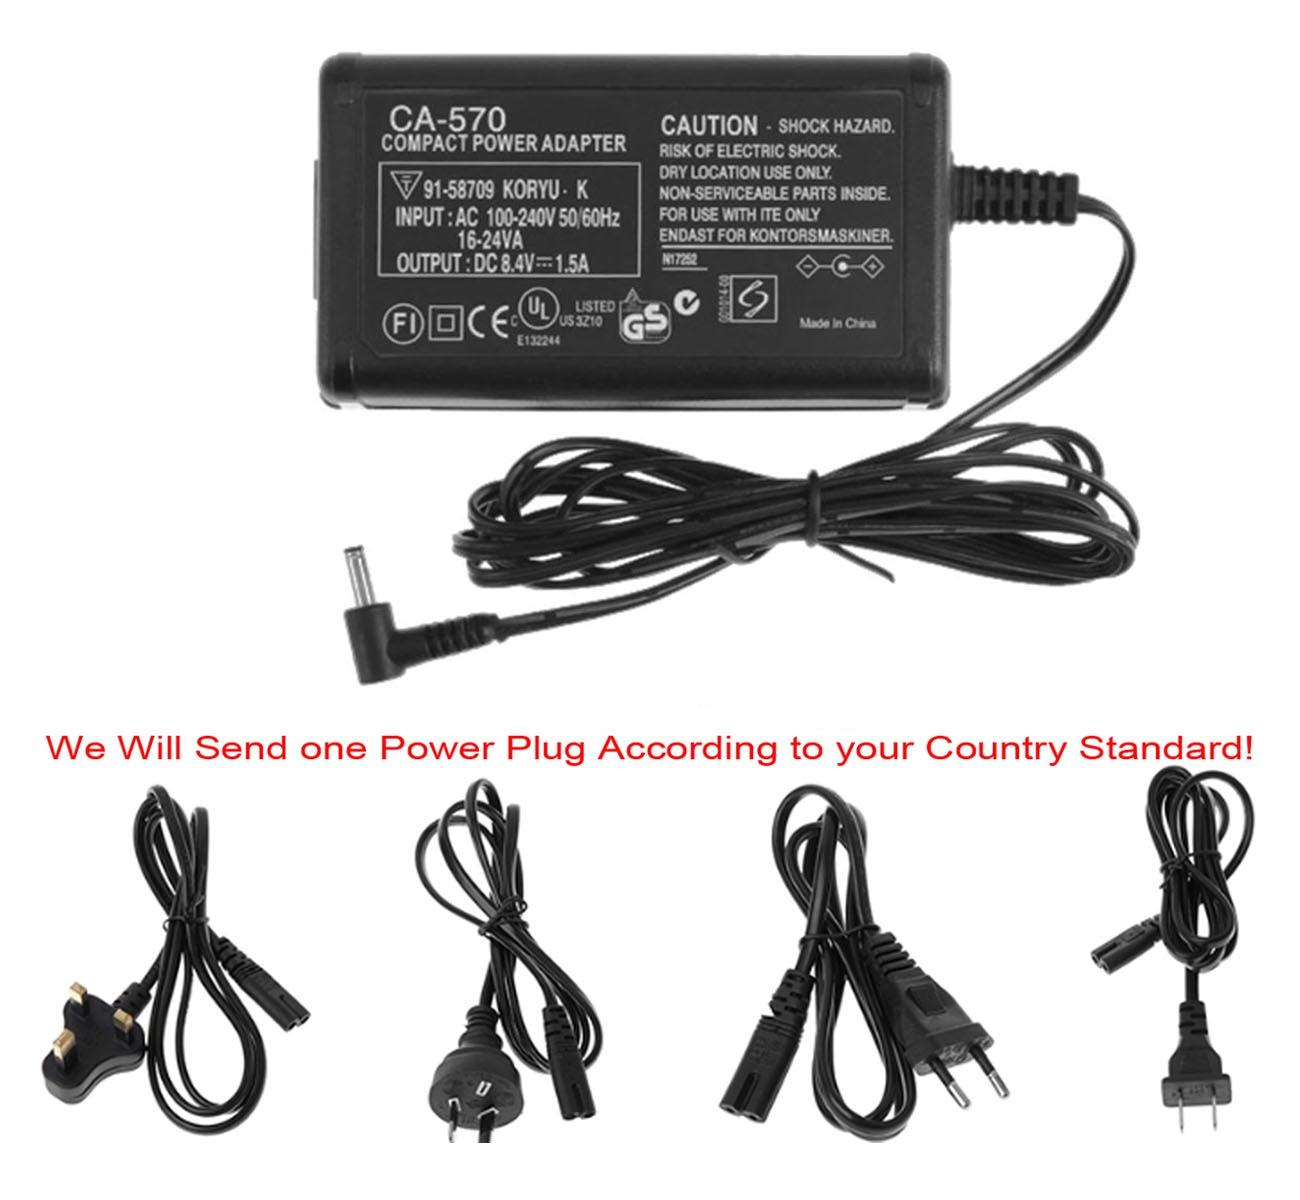 HFM31 HFM32 HFM40 LCD Micro USB Battery Charger For Canon VIXIA HFM30 HFM41 Flash Memory Camcorder